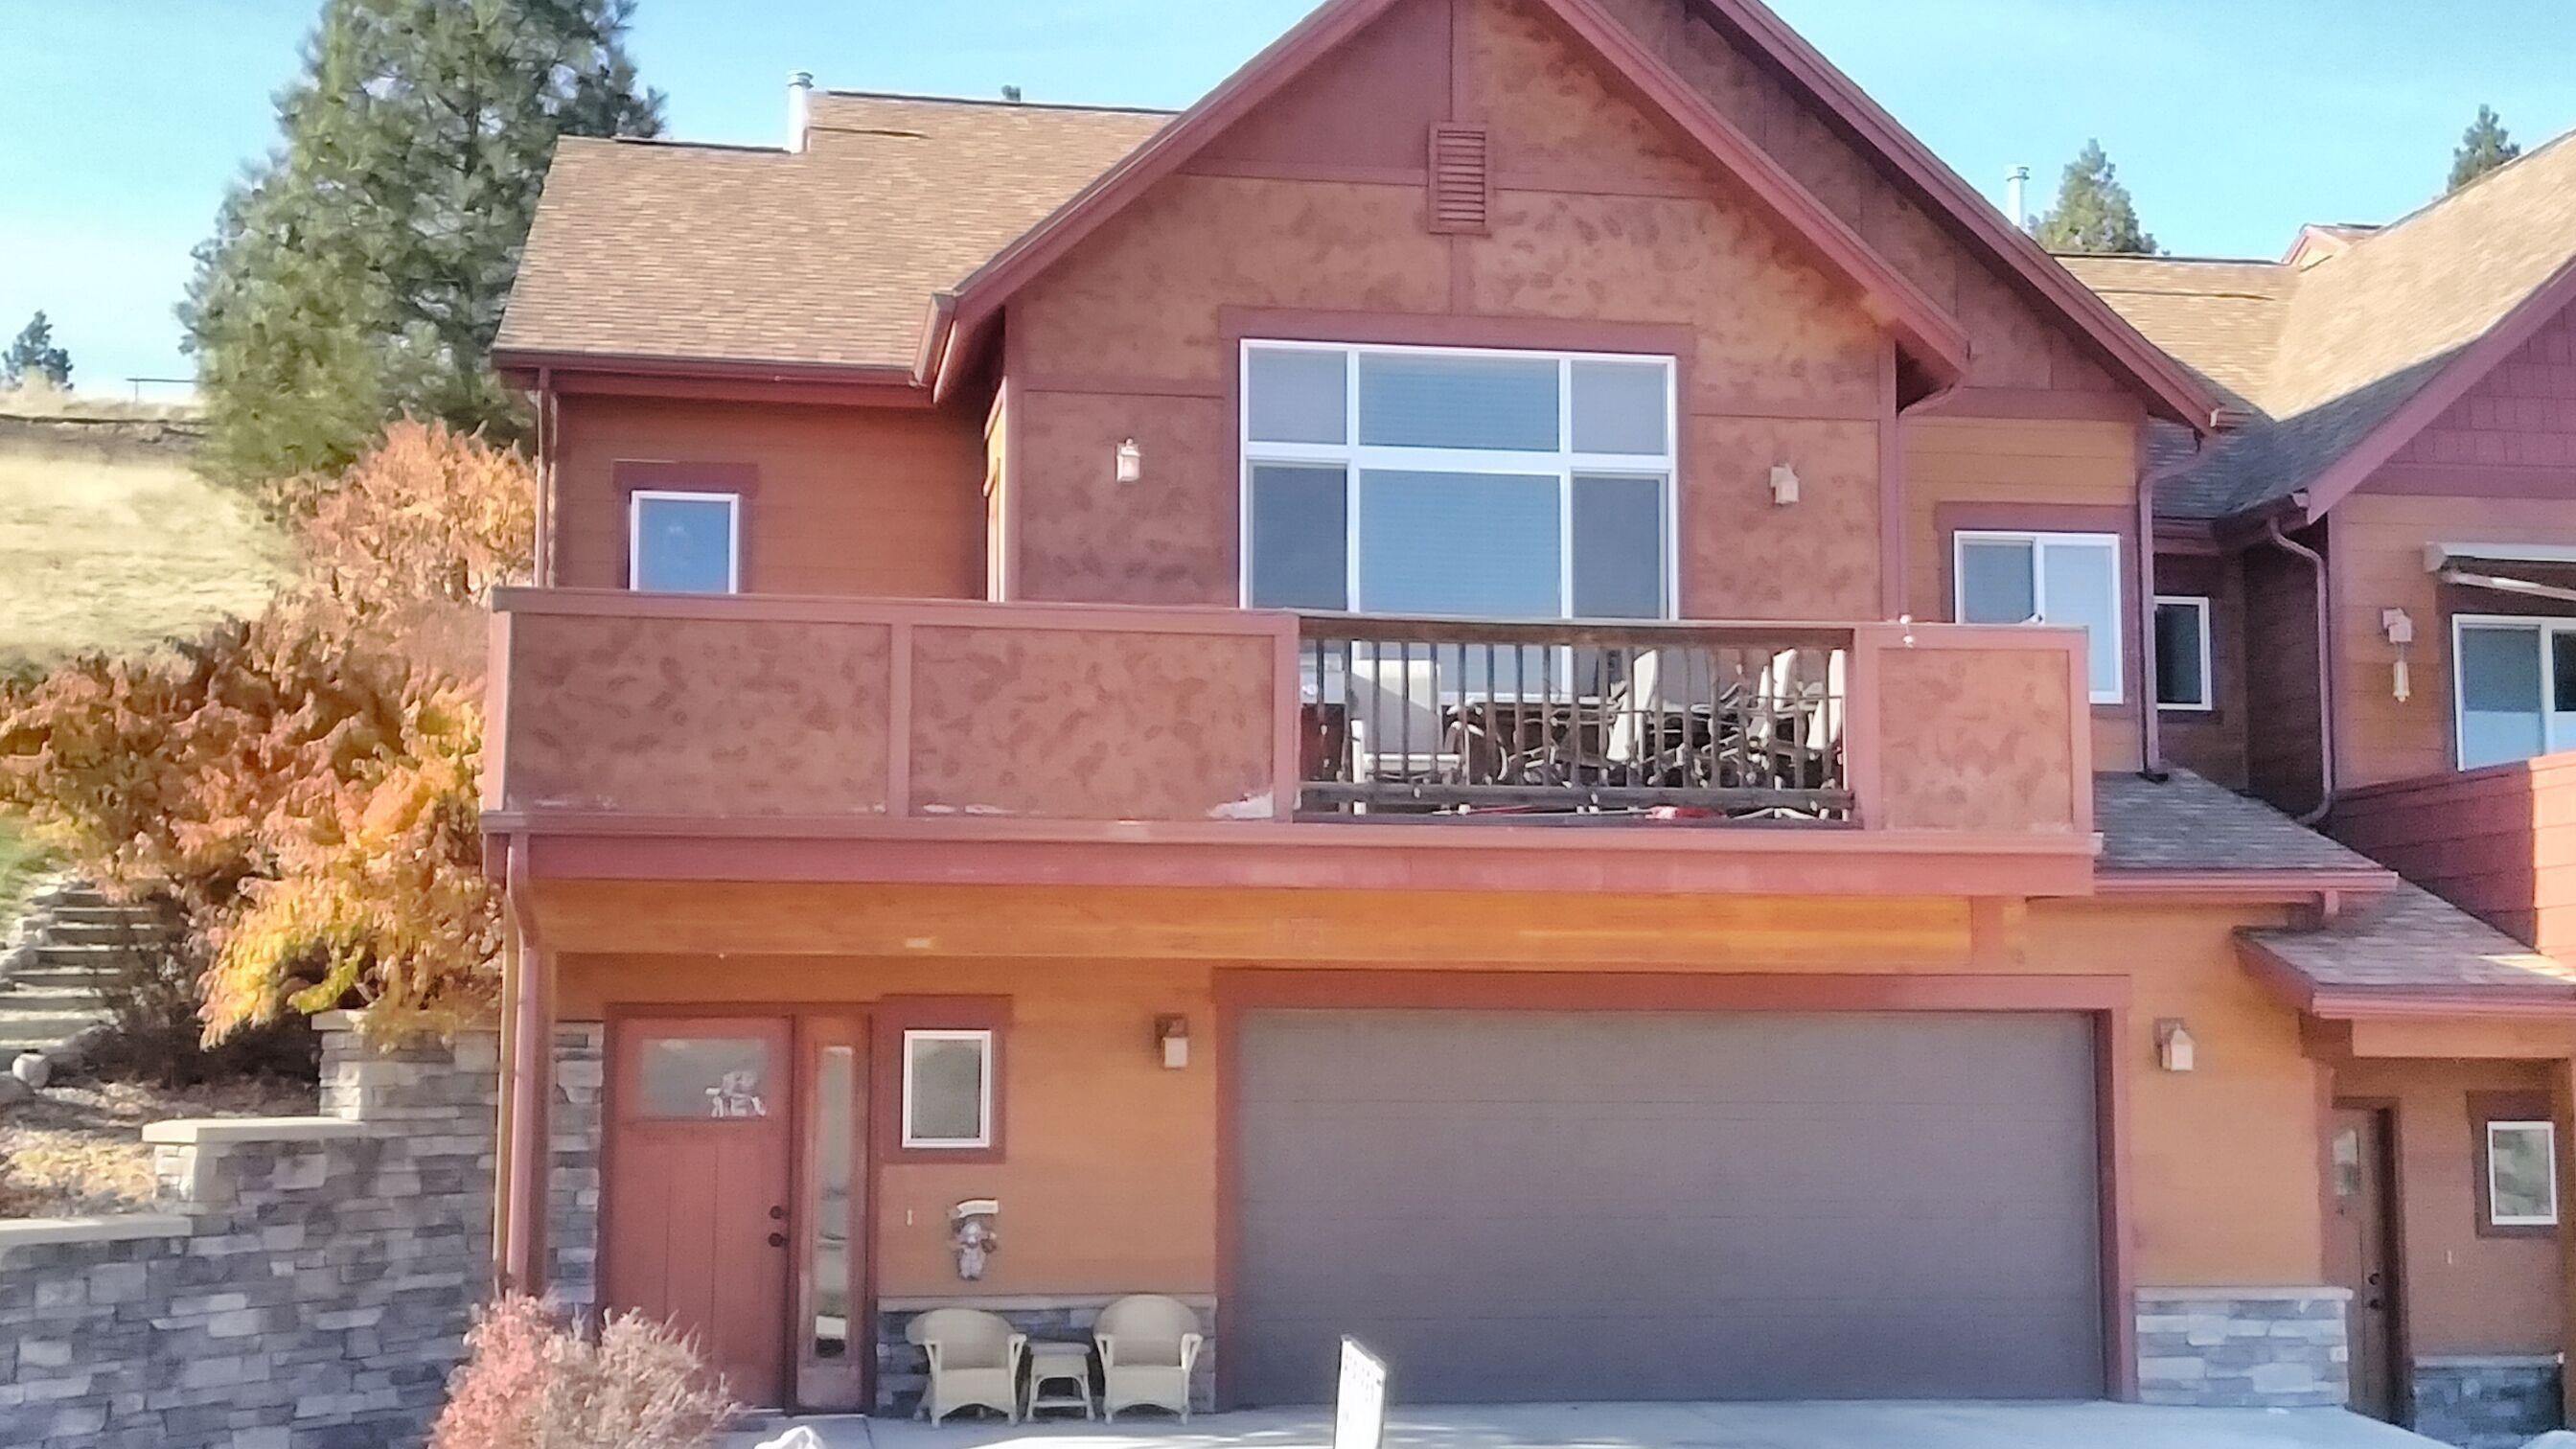 475 Ridgeway Drive, Lolo, MT 59847